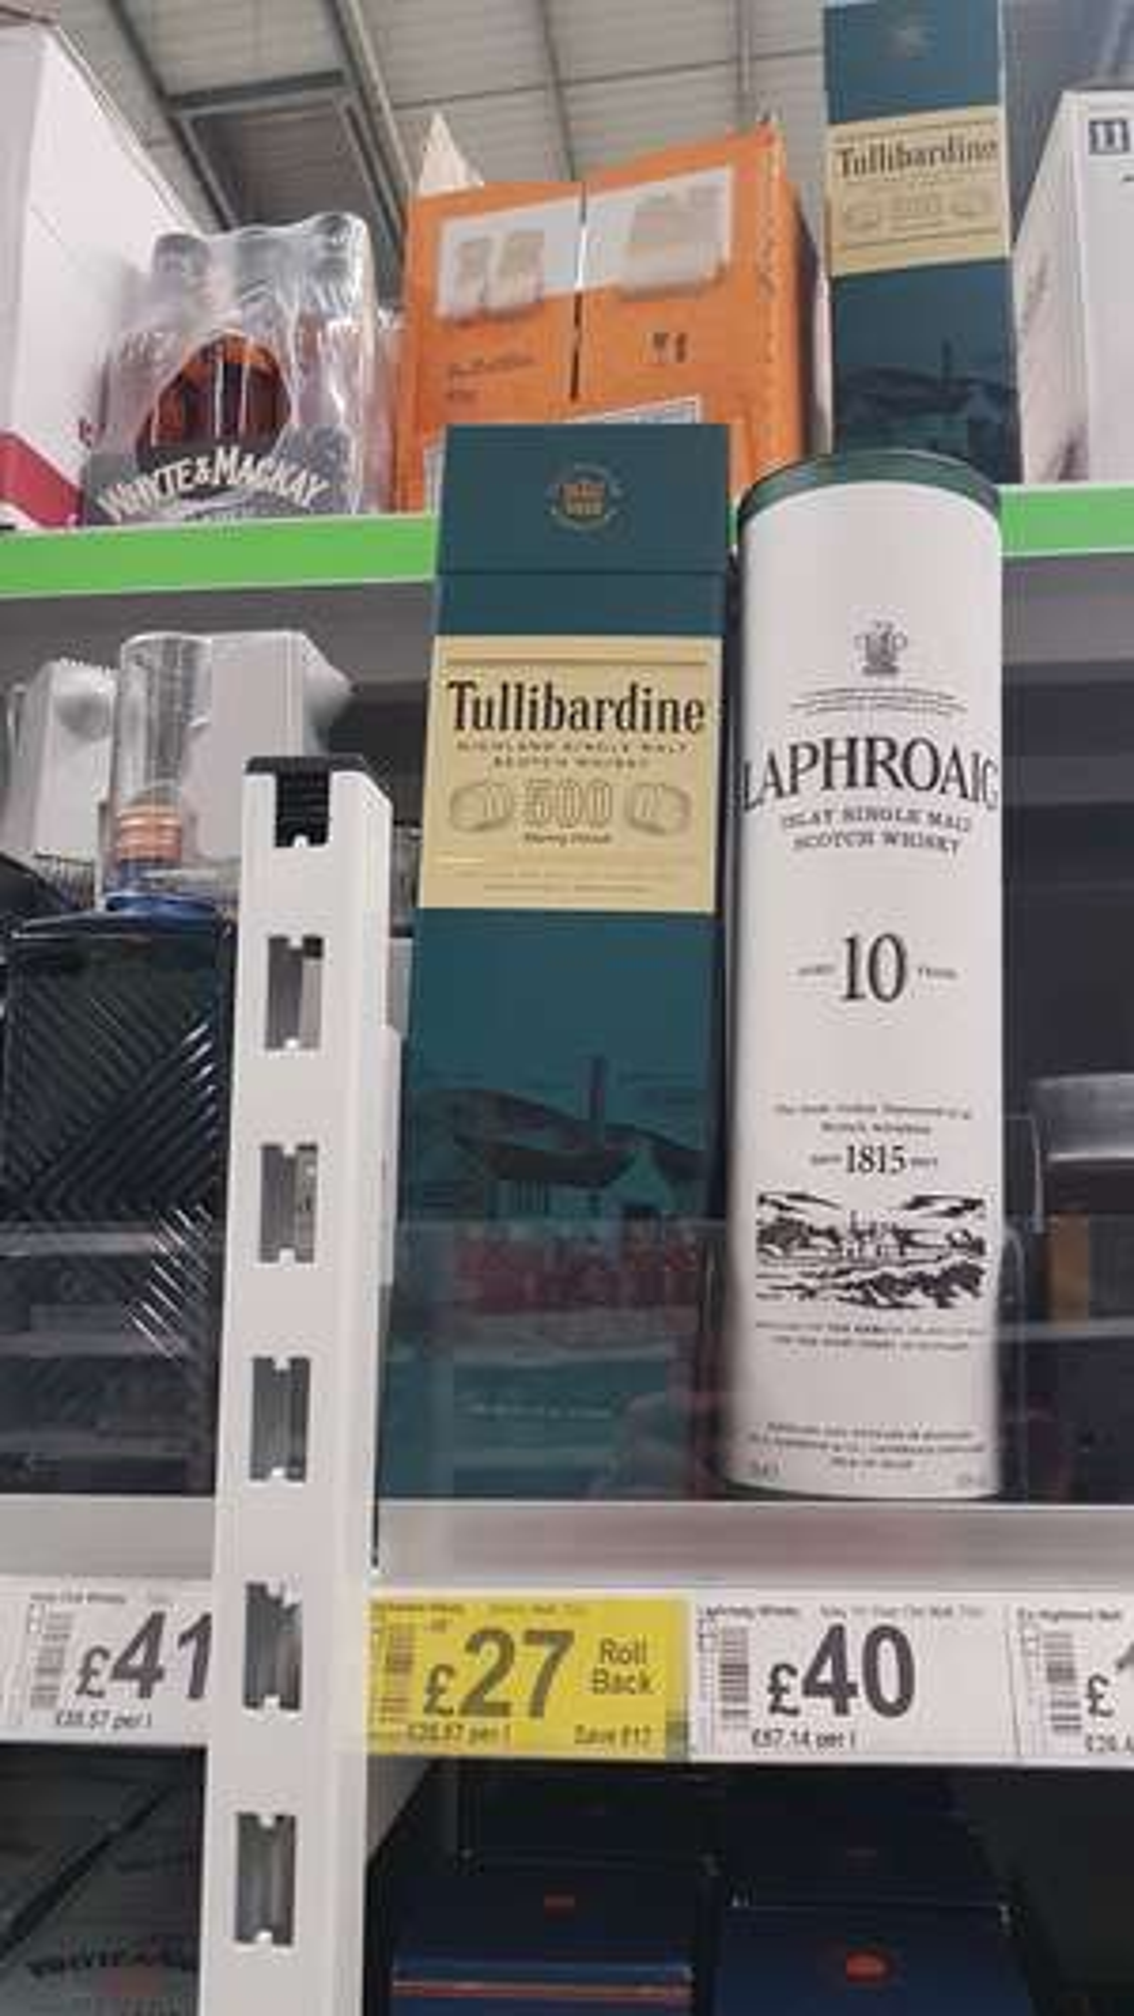 Tullibardine 500 single malt scotch whisky instore at Asda for £27